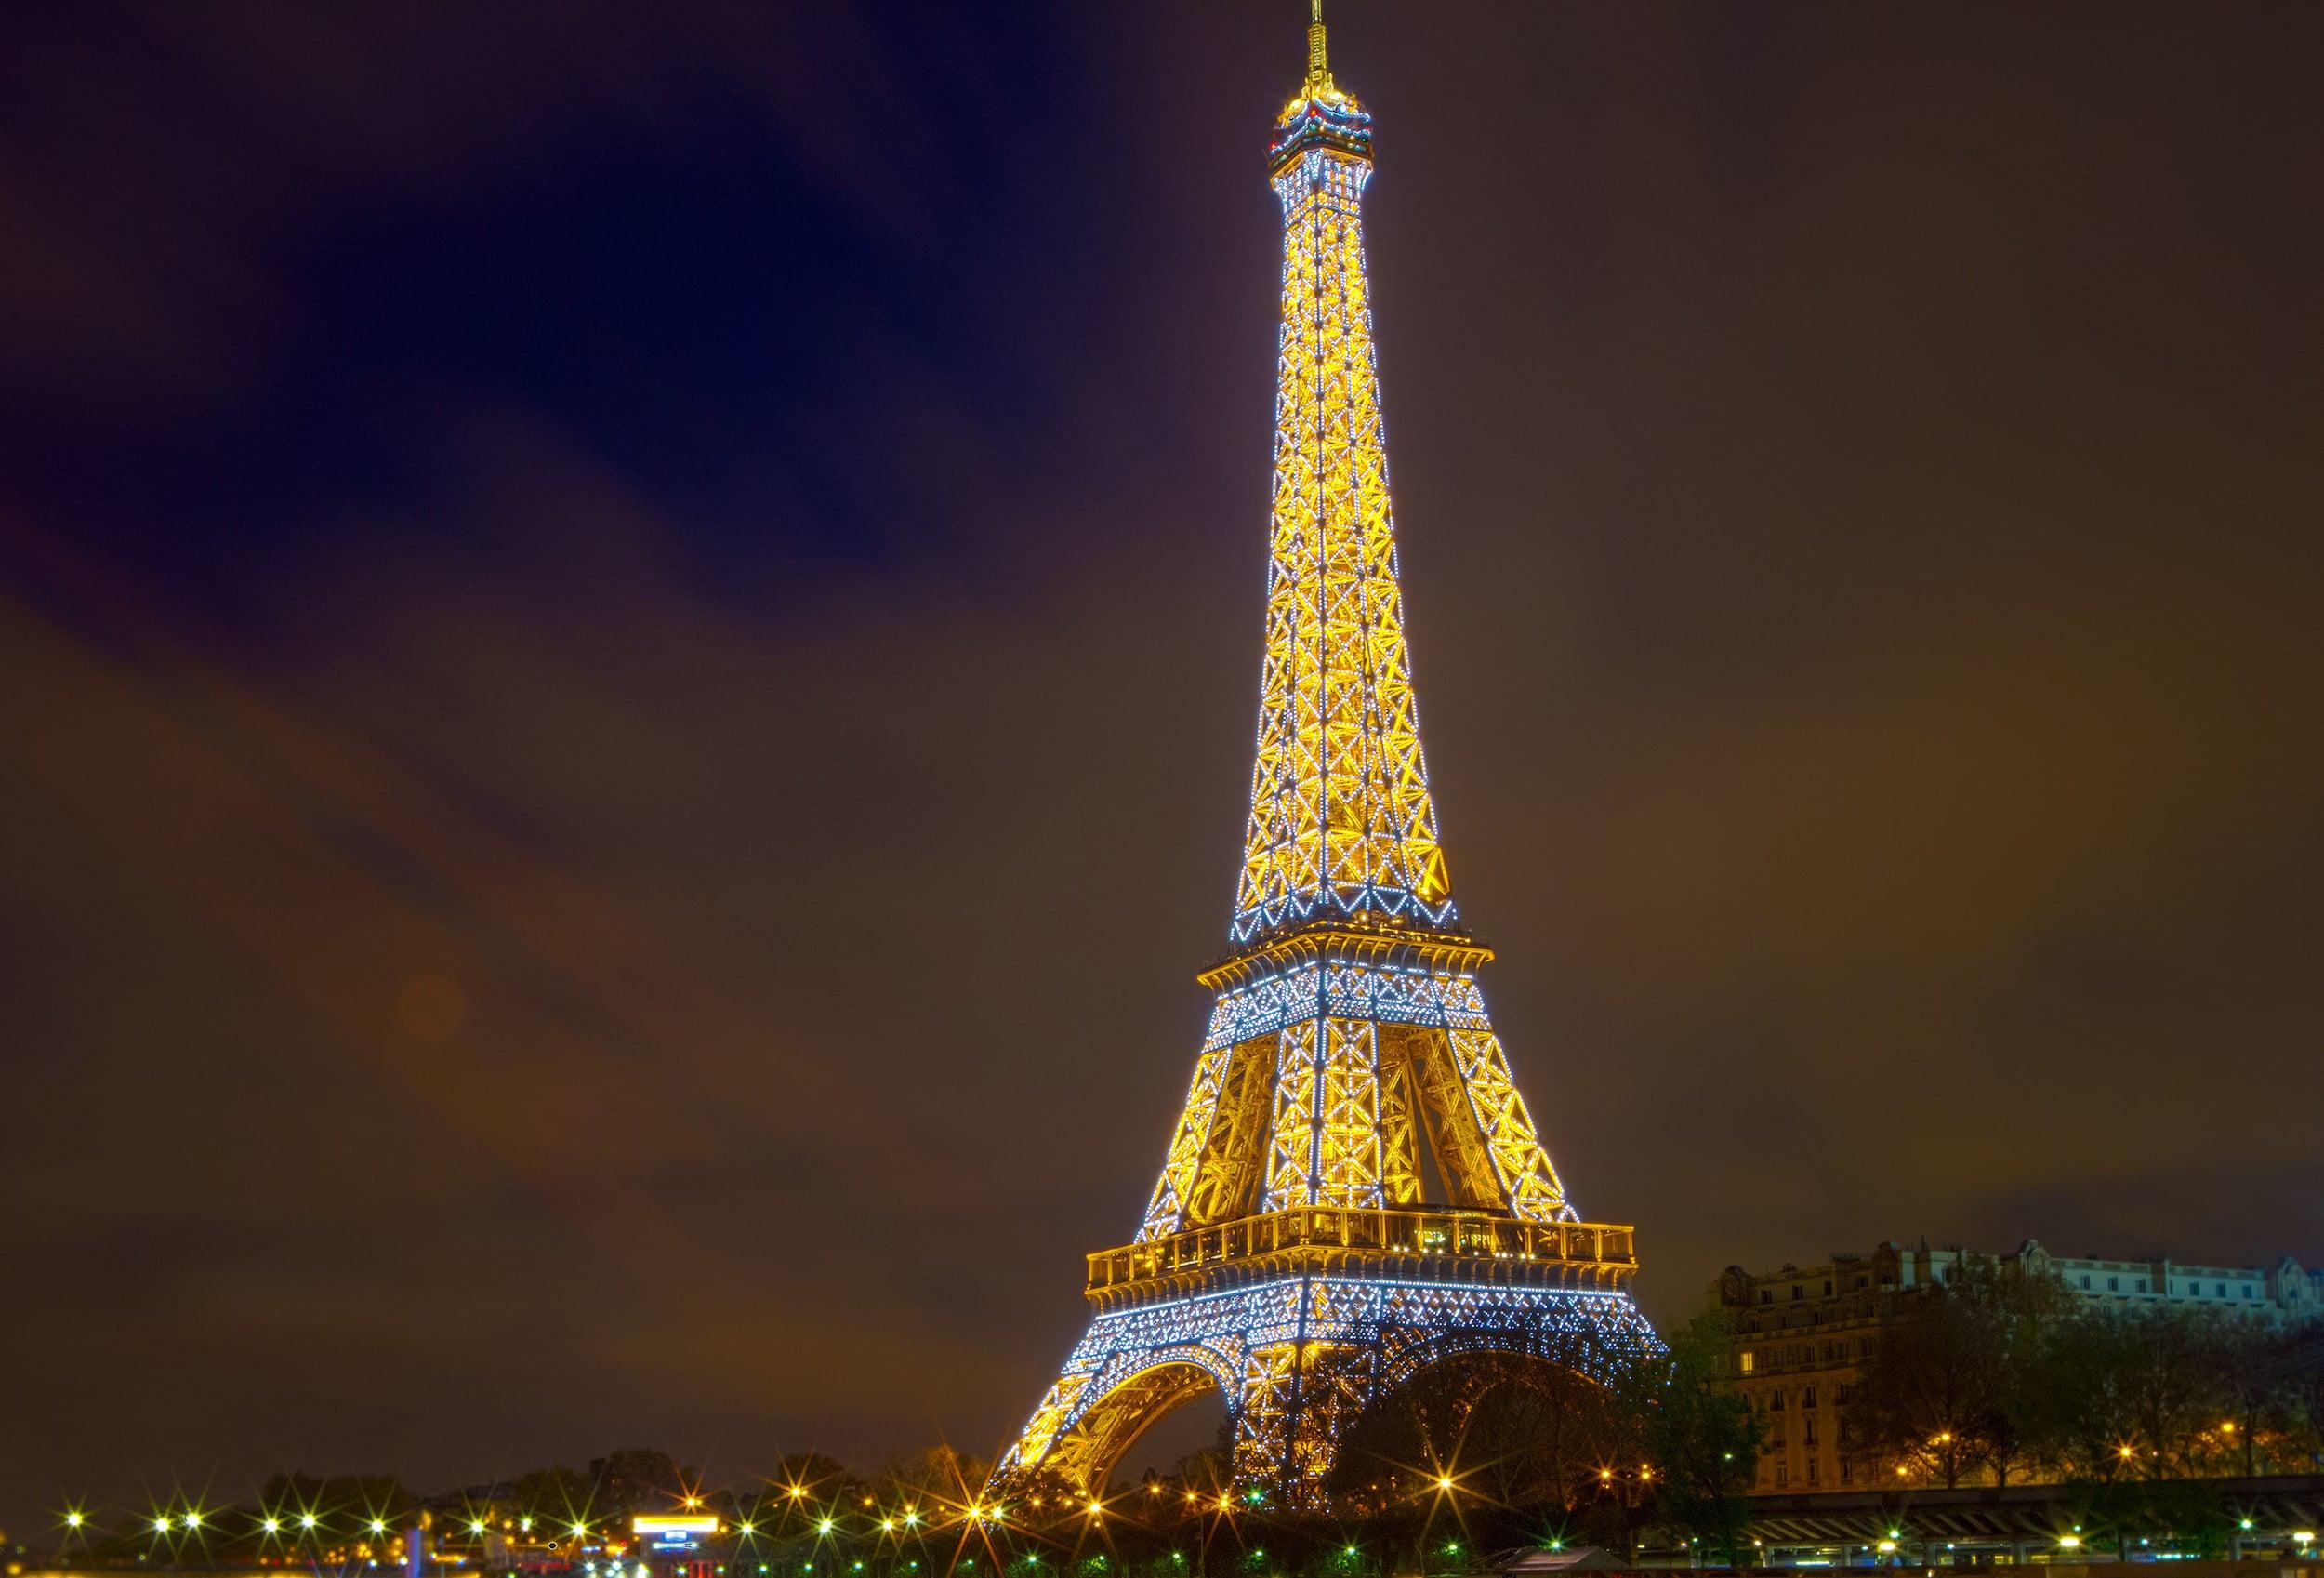 Paris_EiffelTowerTwilight_01-s.jpg